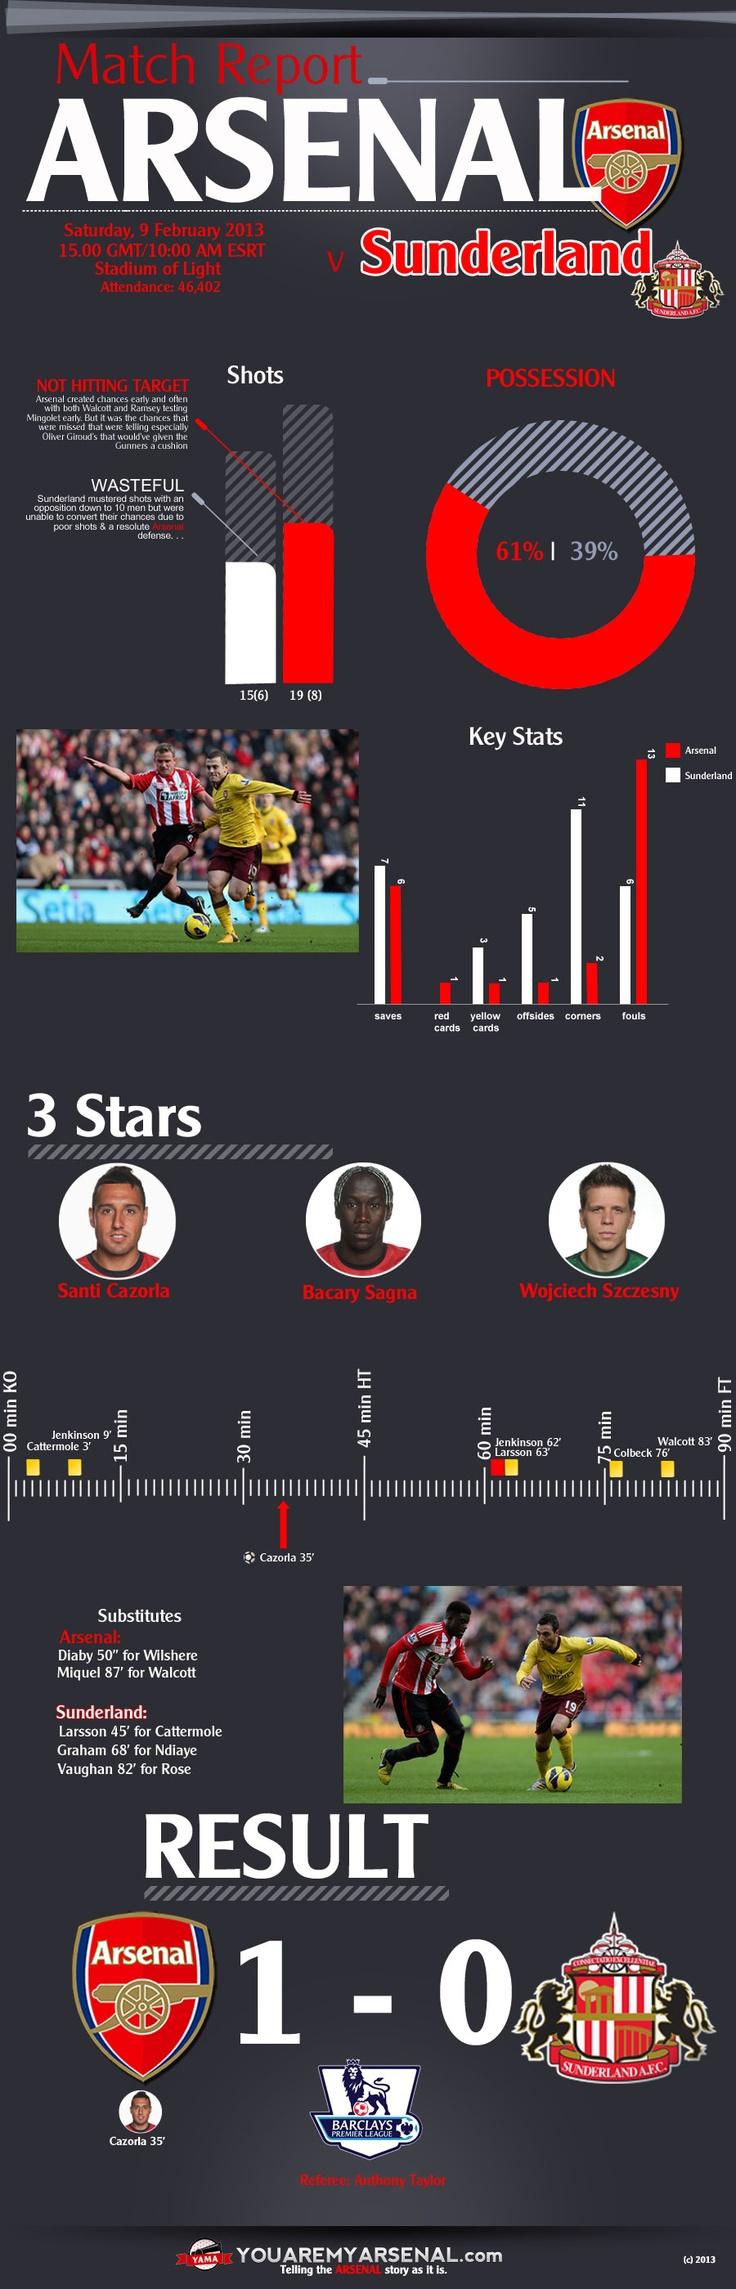 Arsenal v Sunderland Match Report Infographic